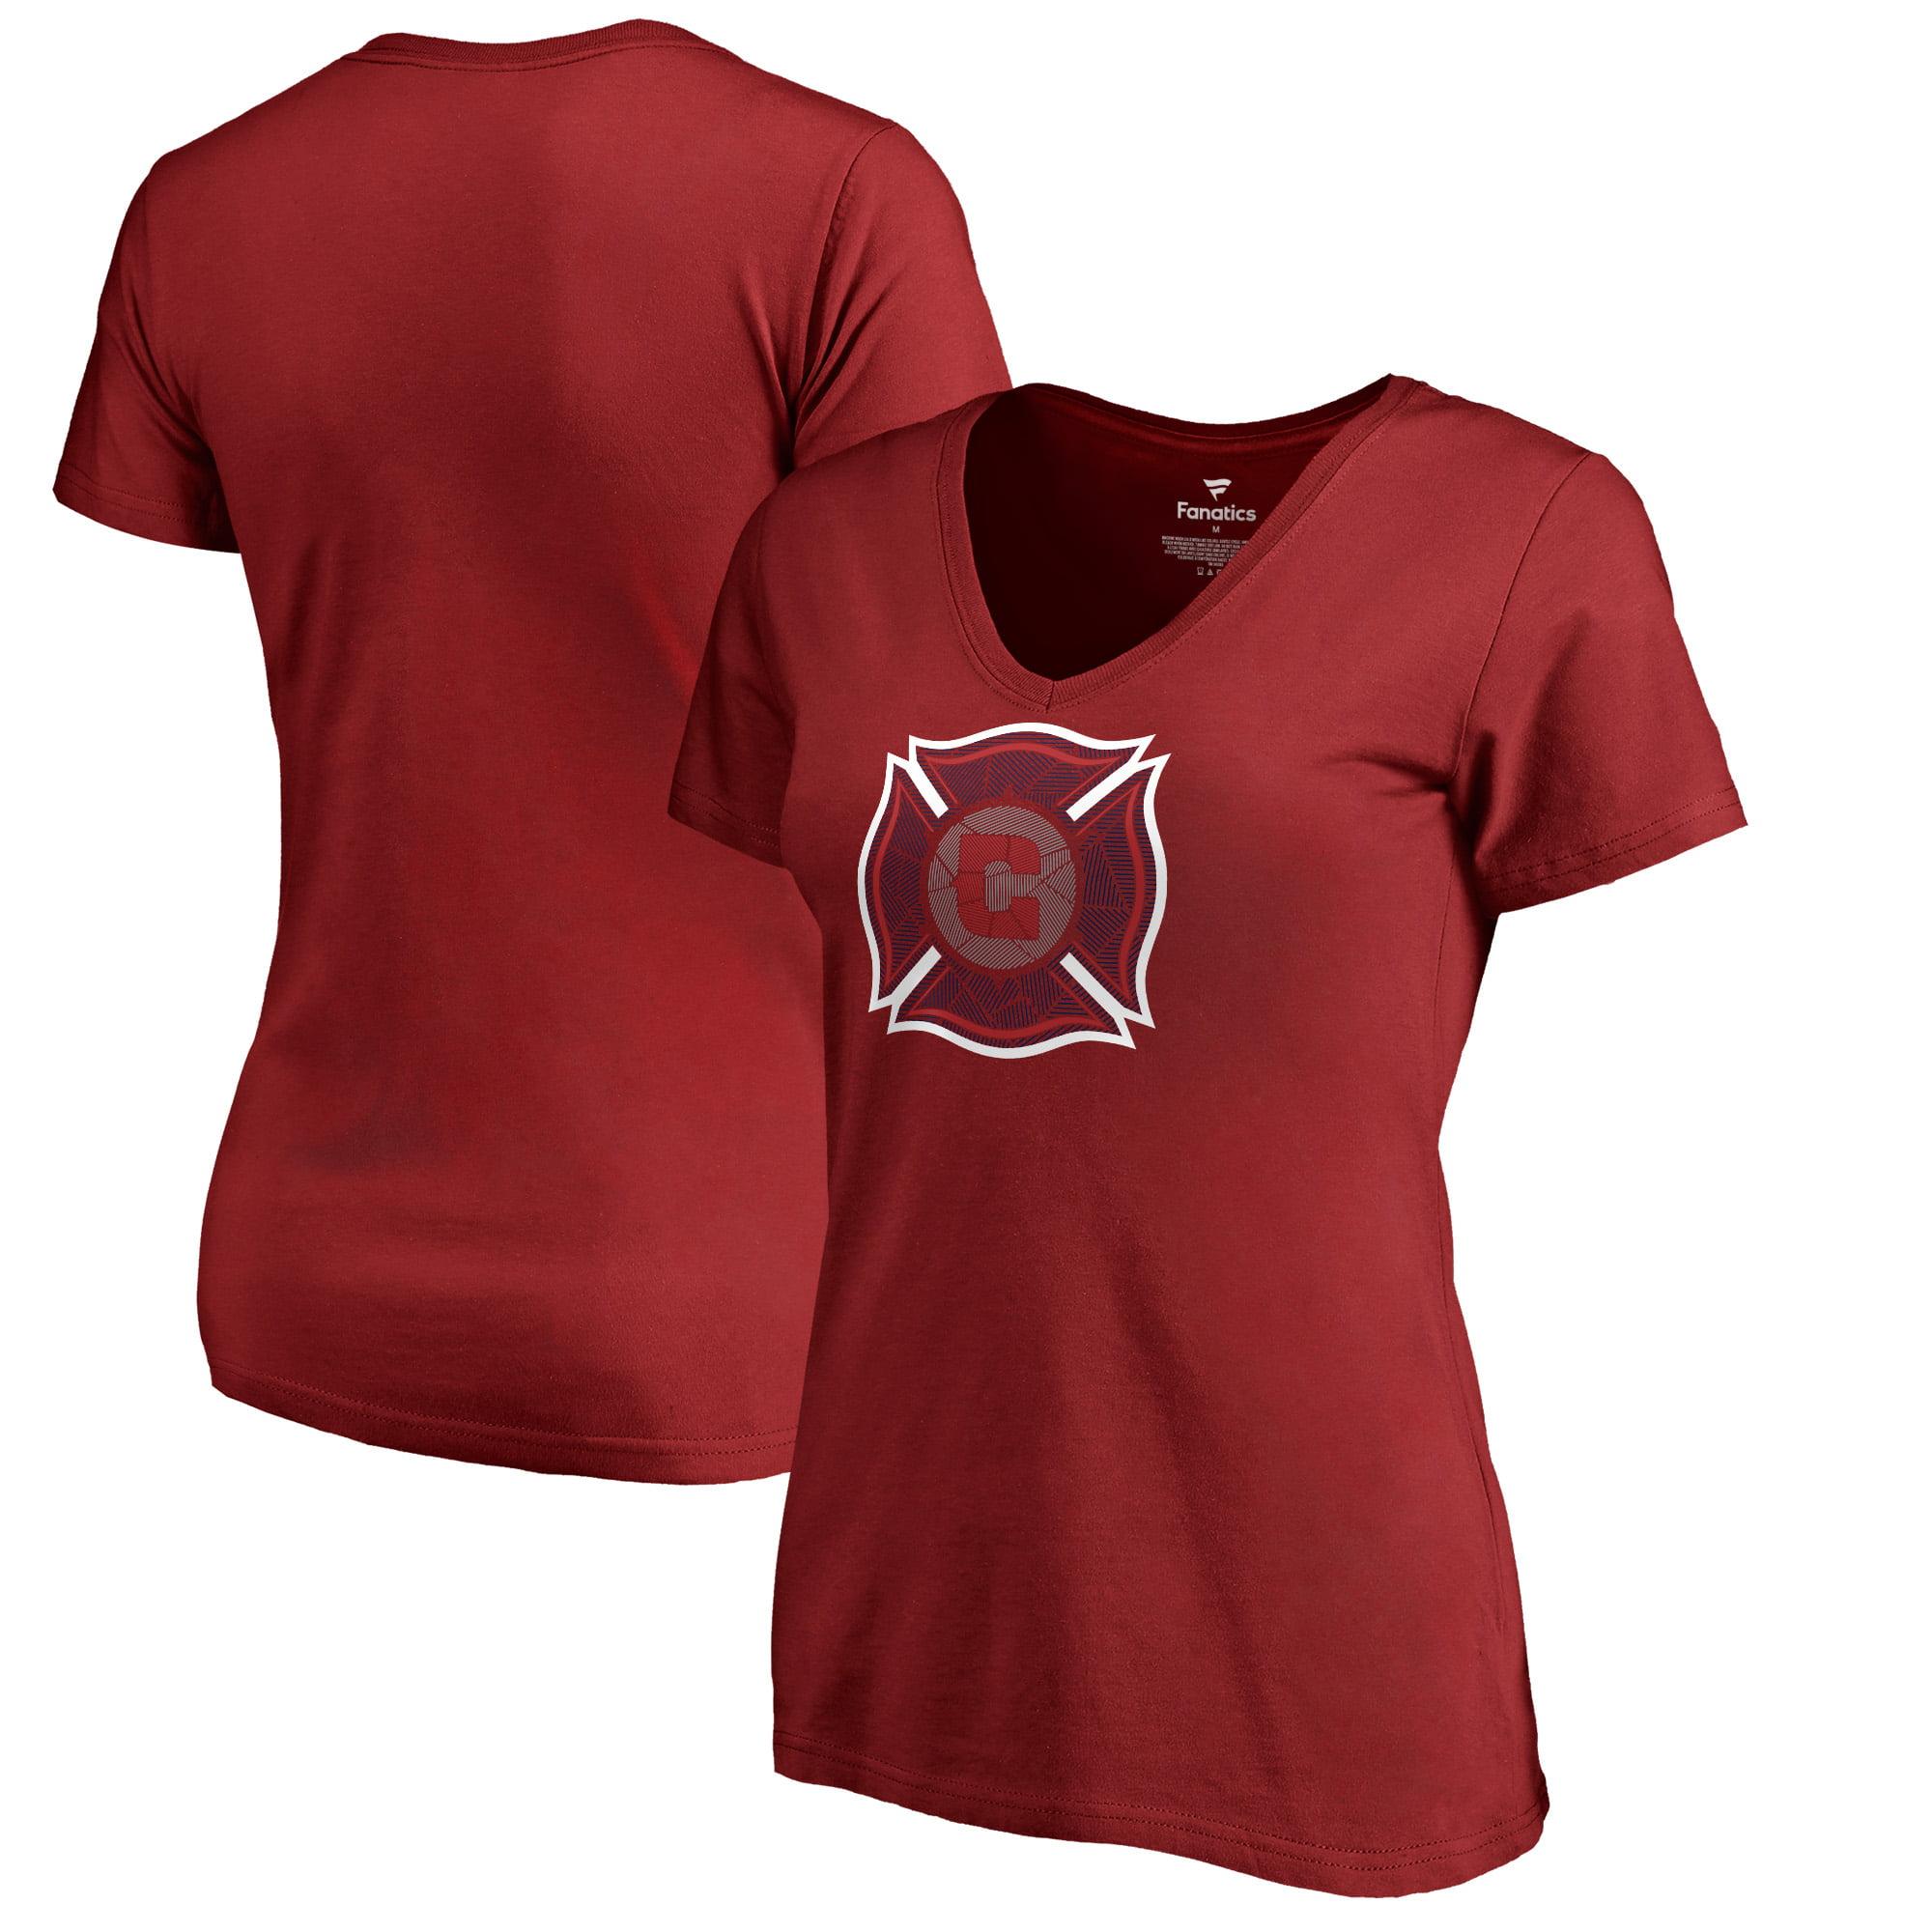 Chicago Fire Fanatics Branded Women's League Trend V-Neck T-Shirt - Red